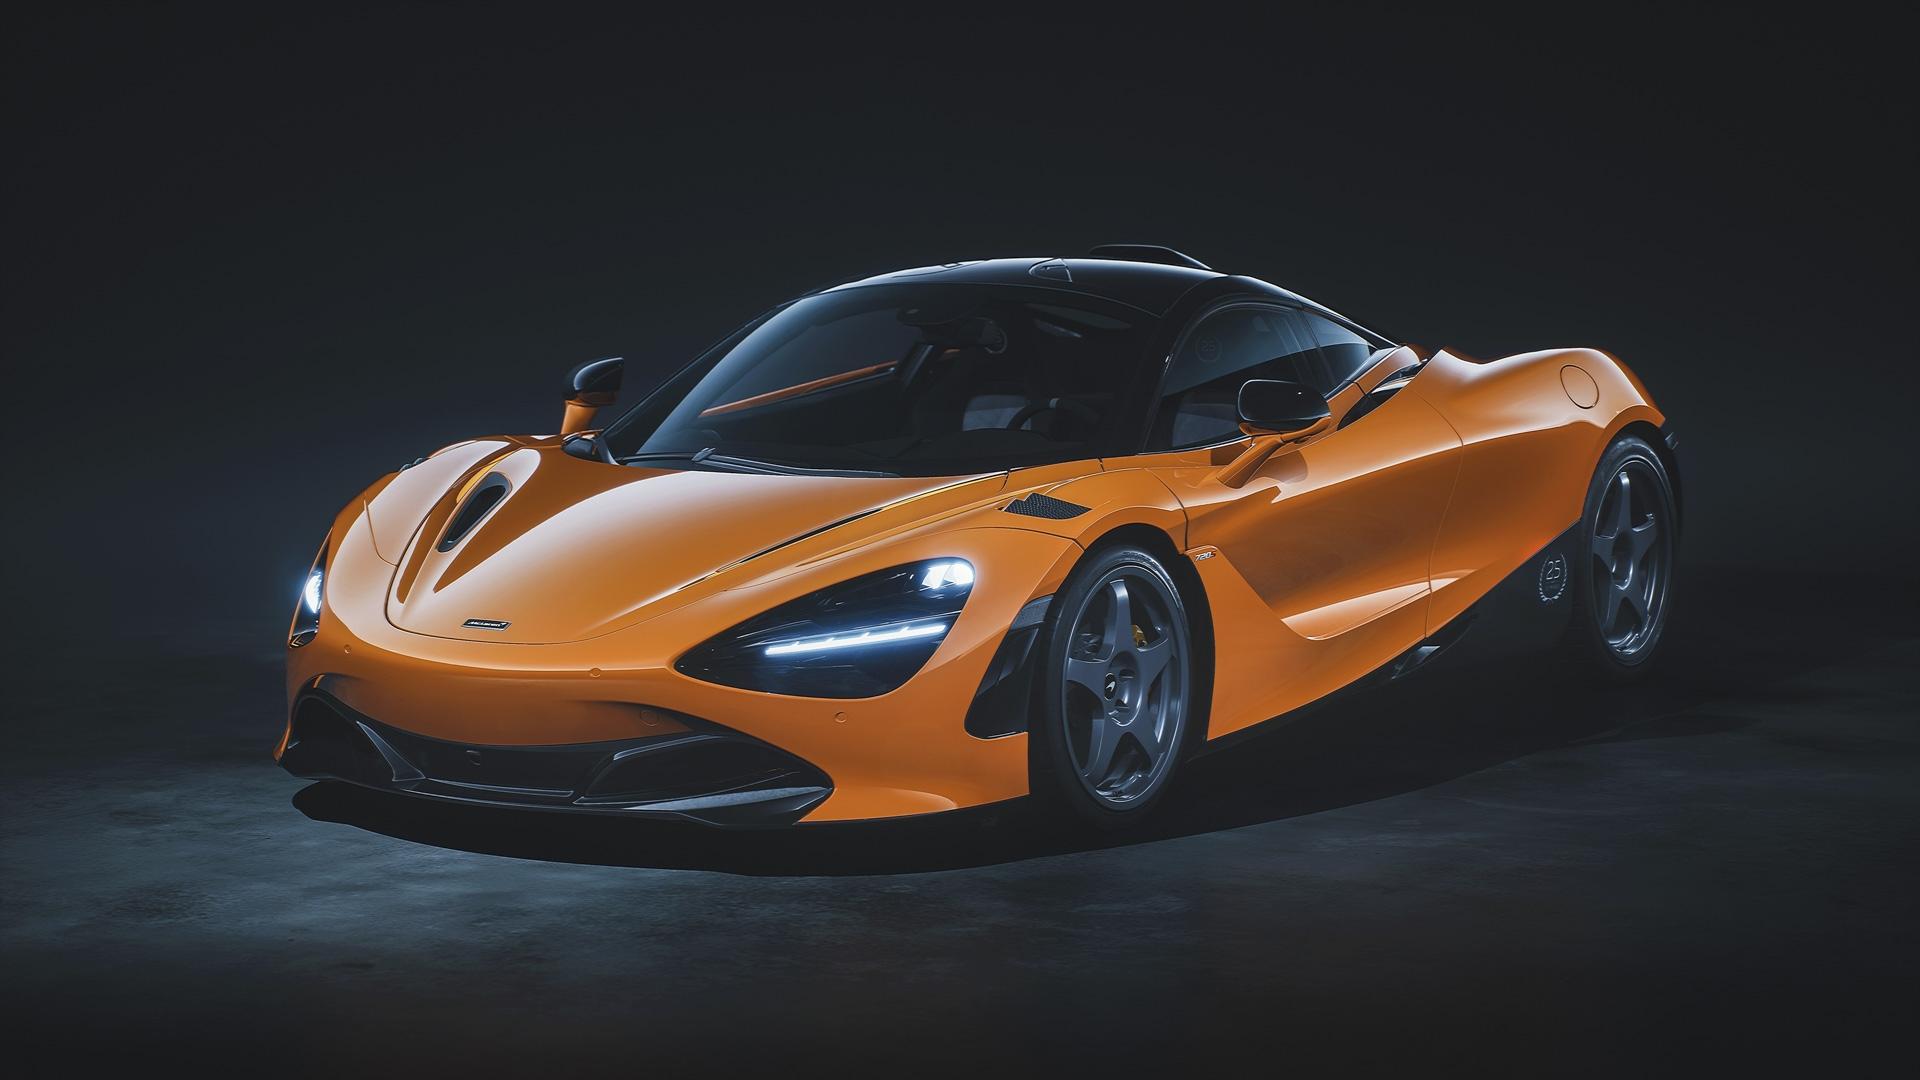 McLaren 720S Le Mans: 50 Cars Worldwide to Celebrate Le Mans Victory